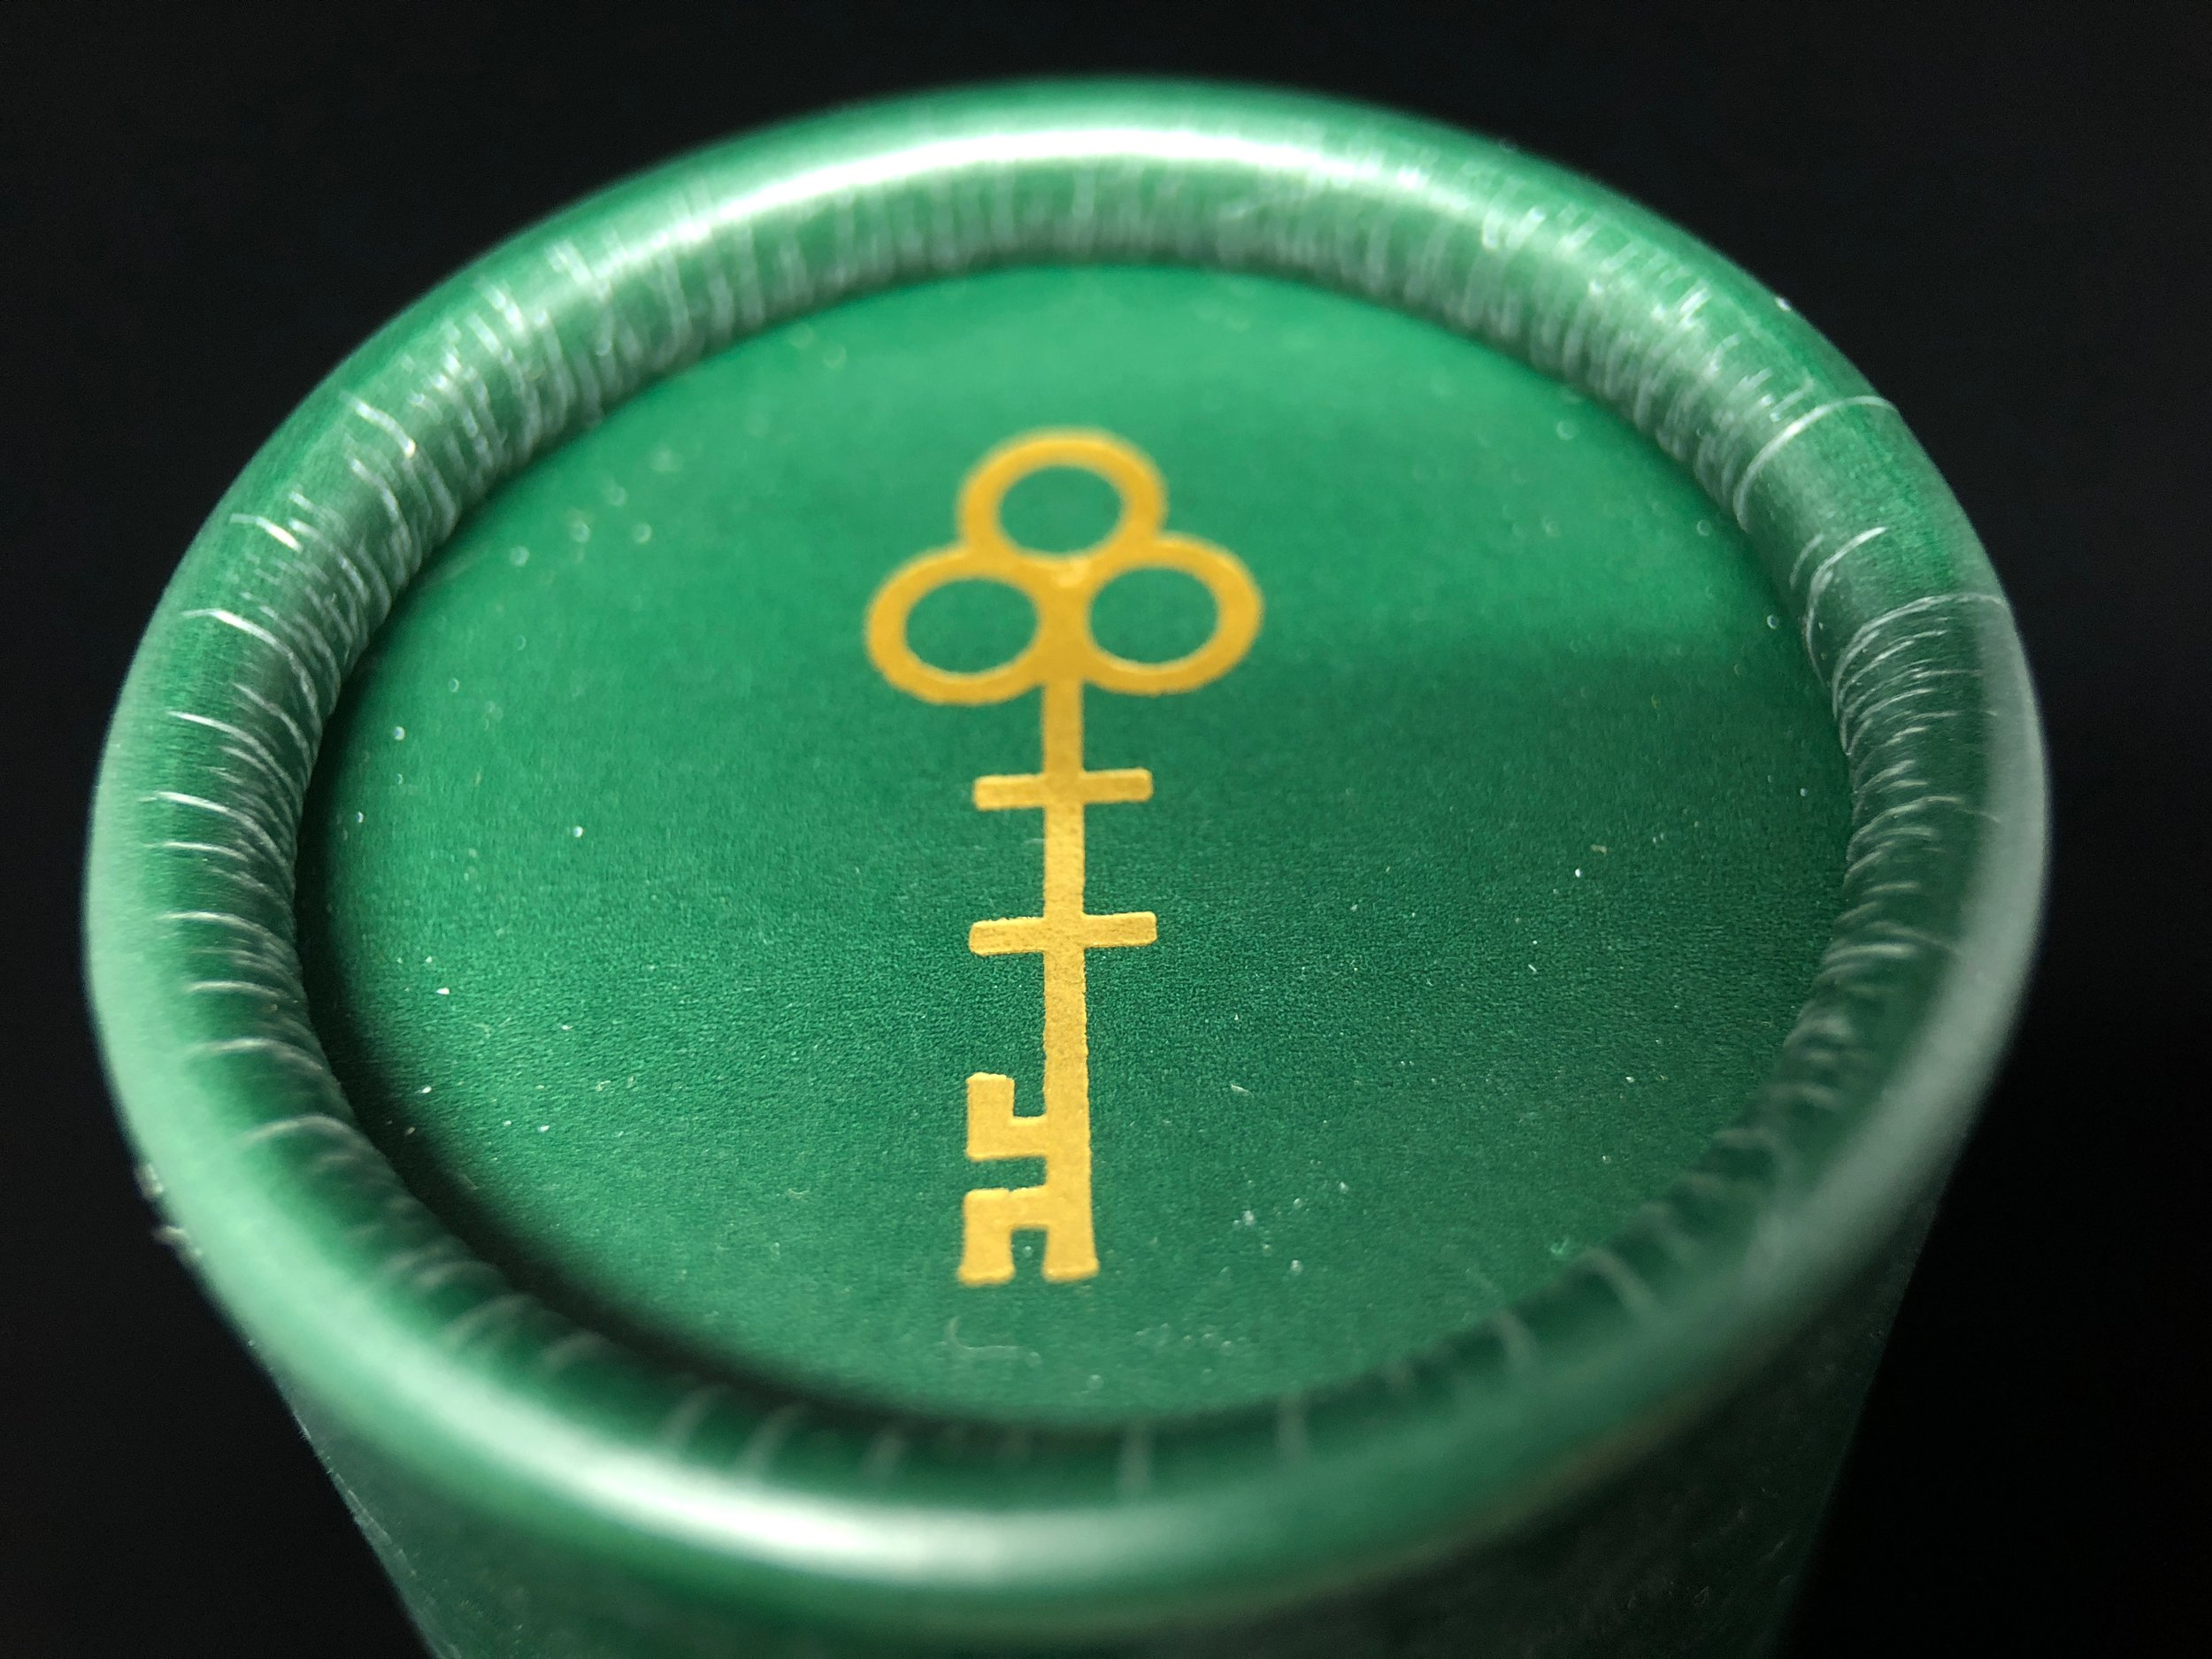 baron-fig-squire-pen-key-brass-2.jpg